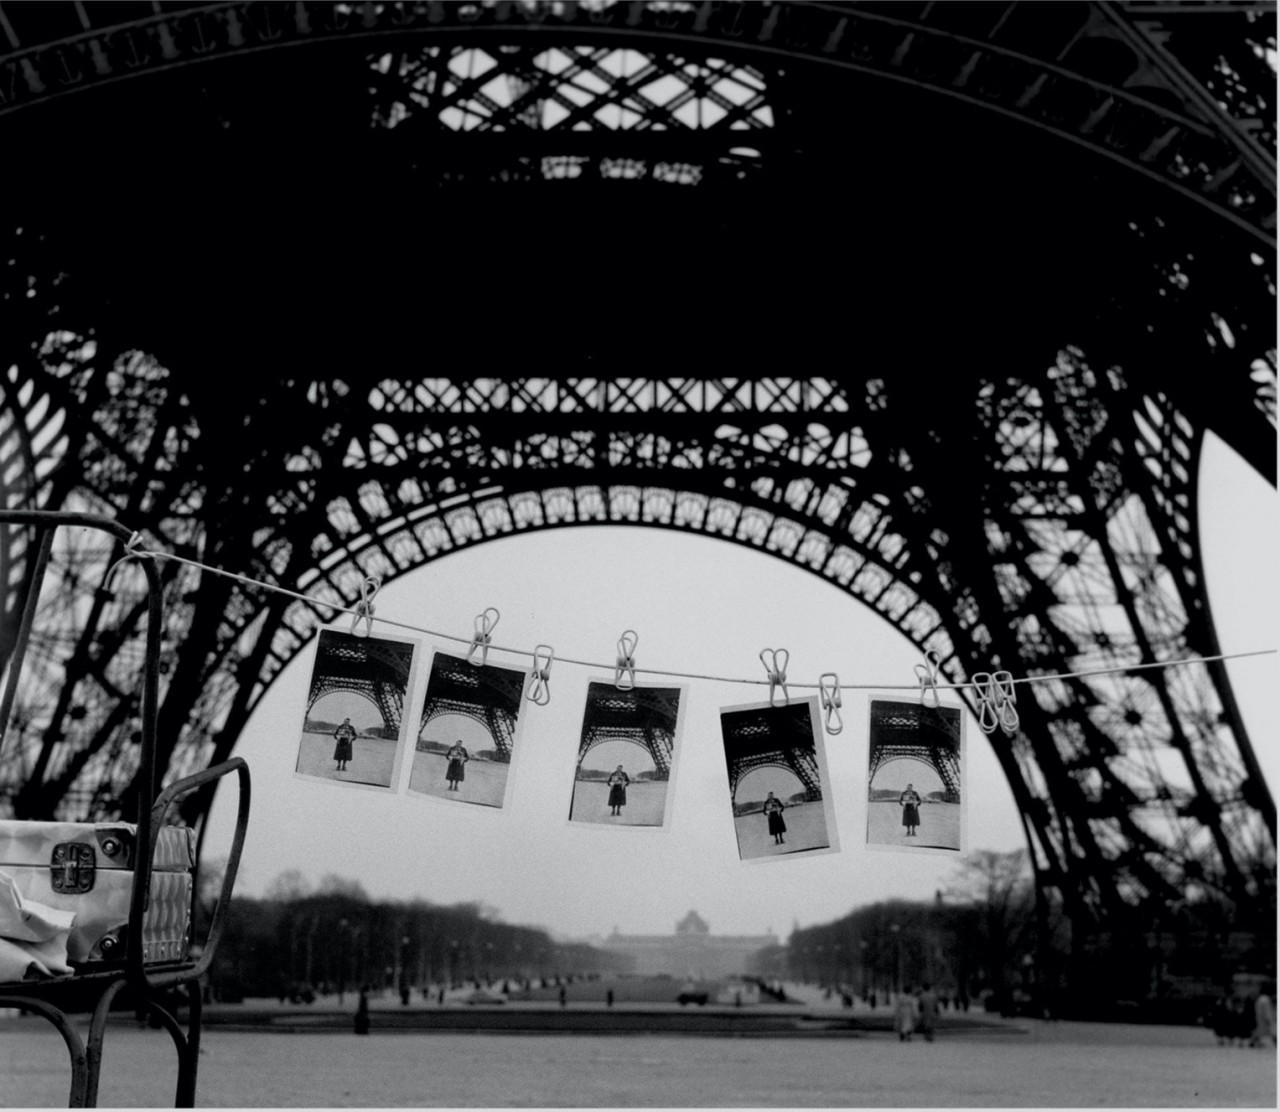 Сушка на Эйфелевой башне, 1955. Фотограф Сабина Вайс